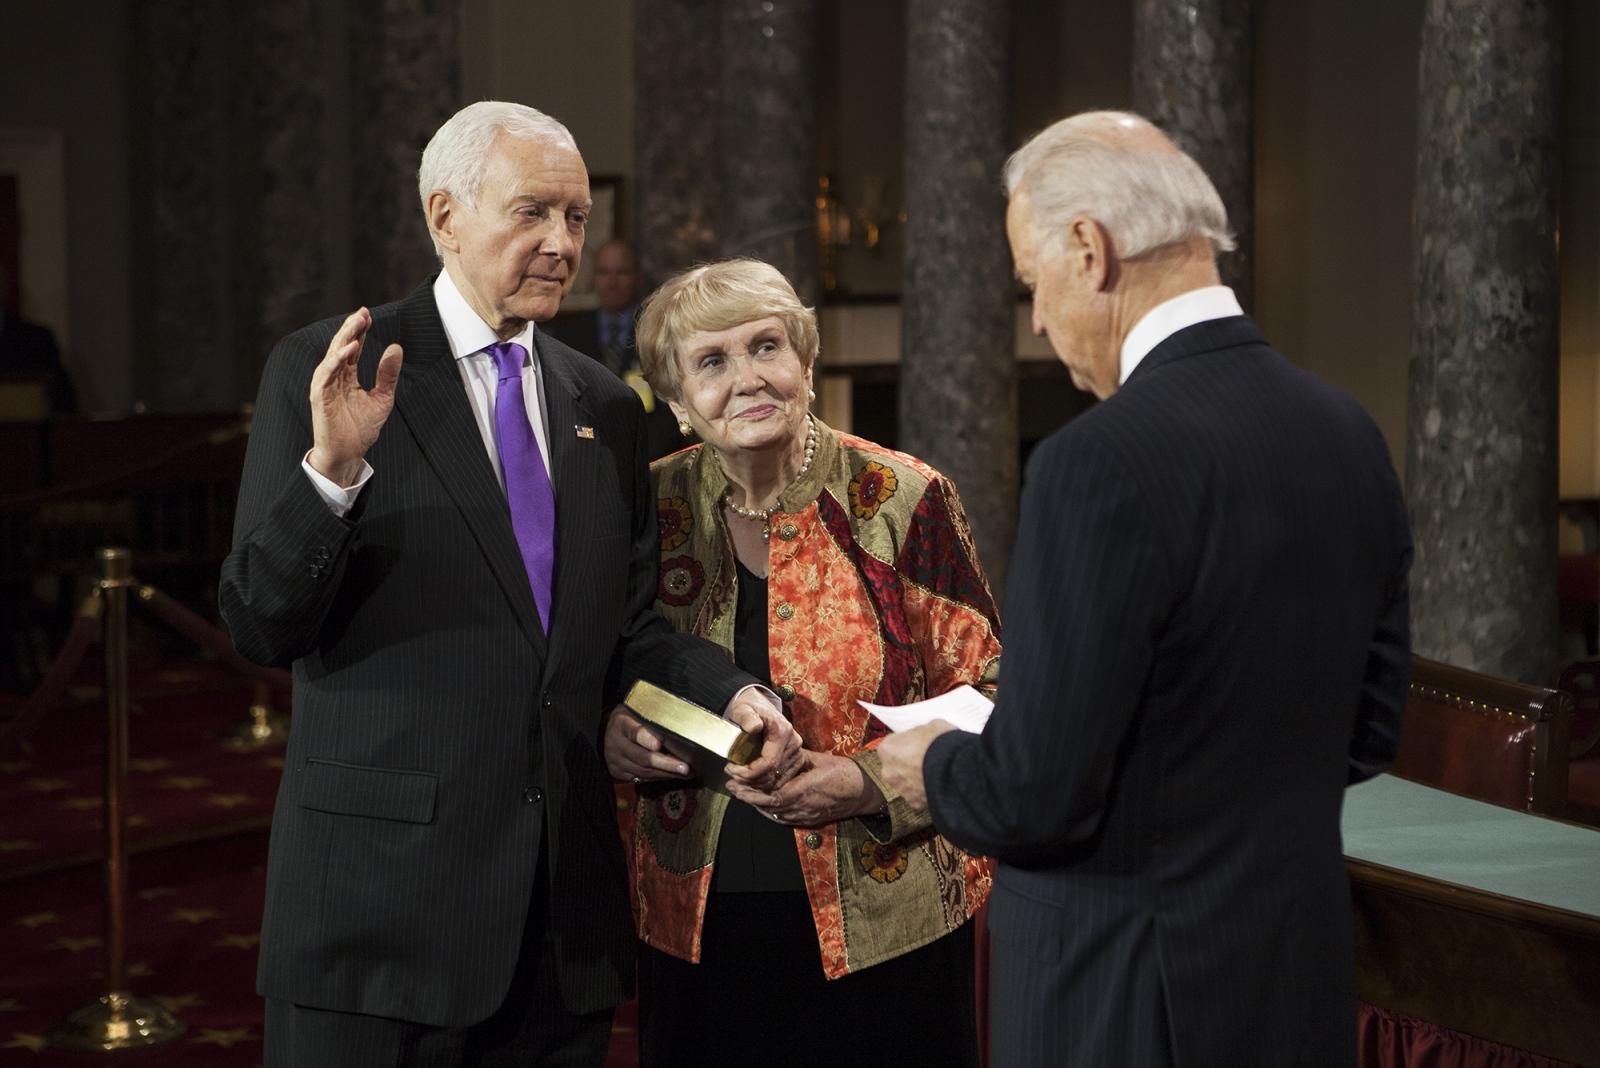 Senator Orrin Hatch, with his wife Elaine, being sworn in by then Vice President Joe Biden.